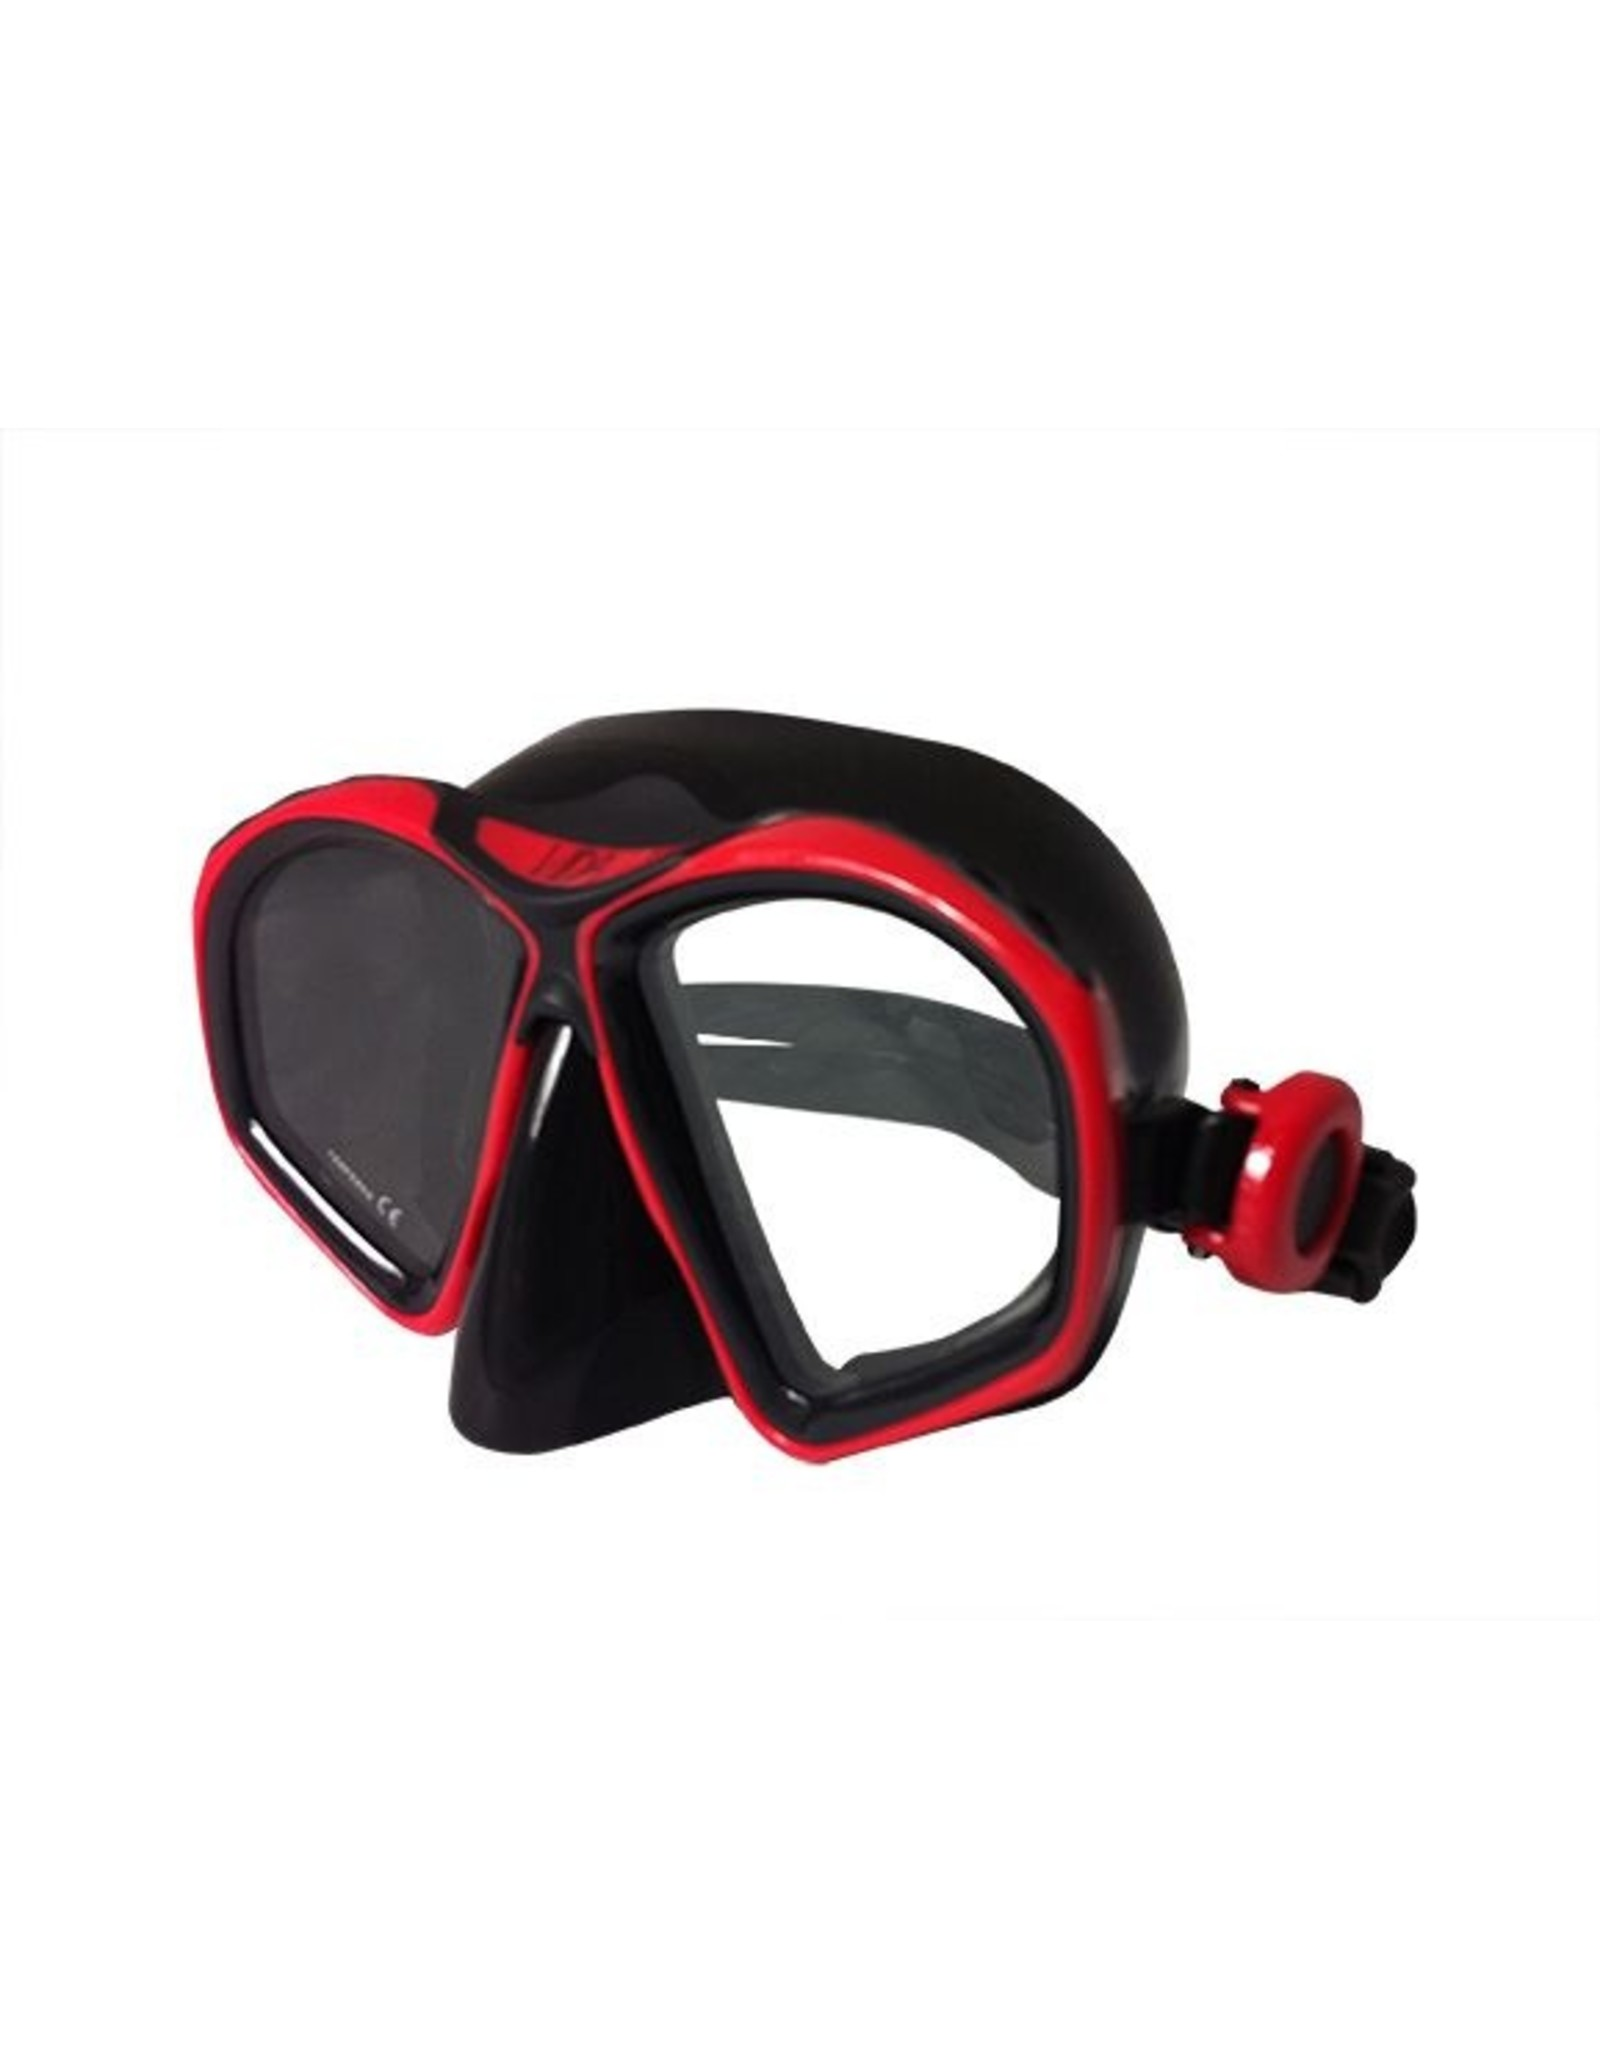 Sherwood Vida Mask